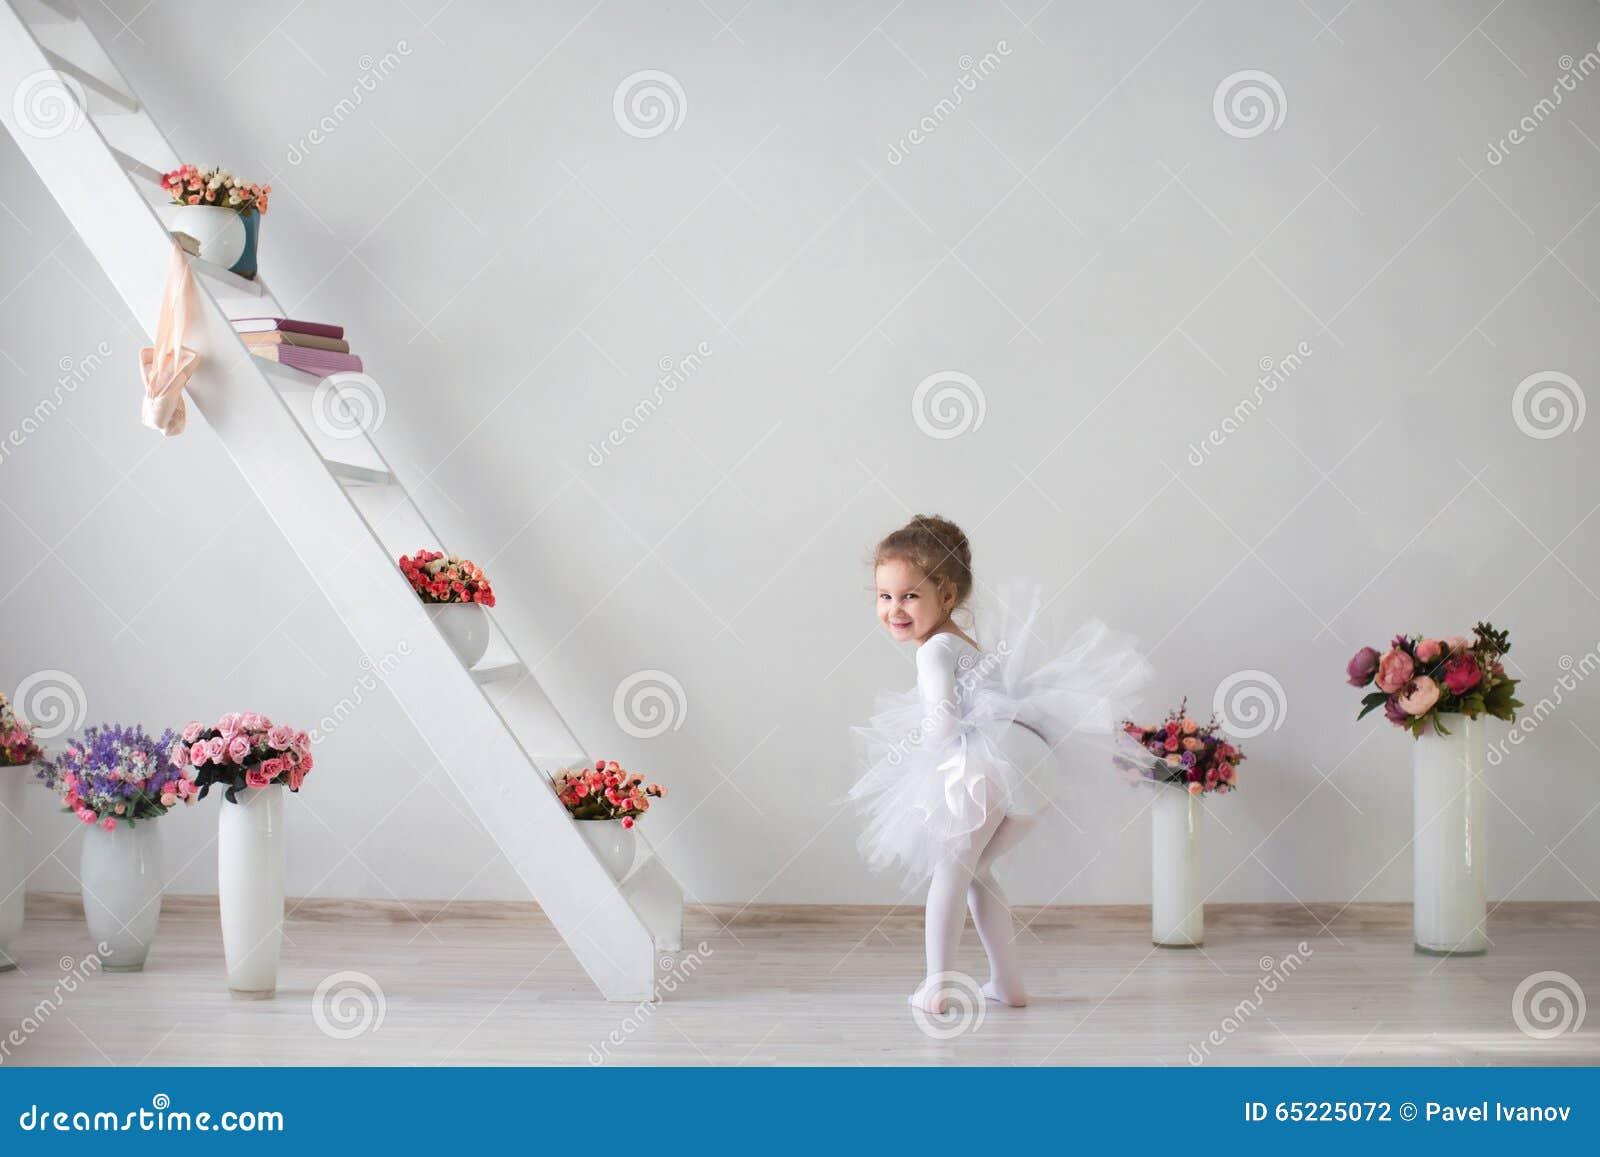 Full length portrait of a little pretty ballerina.